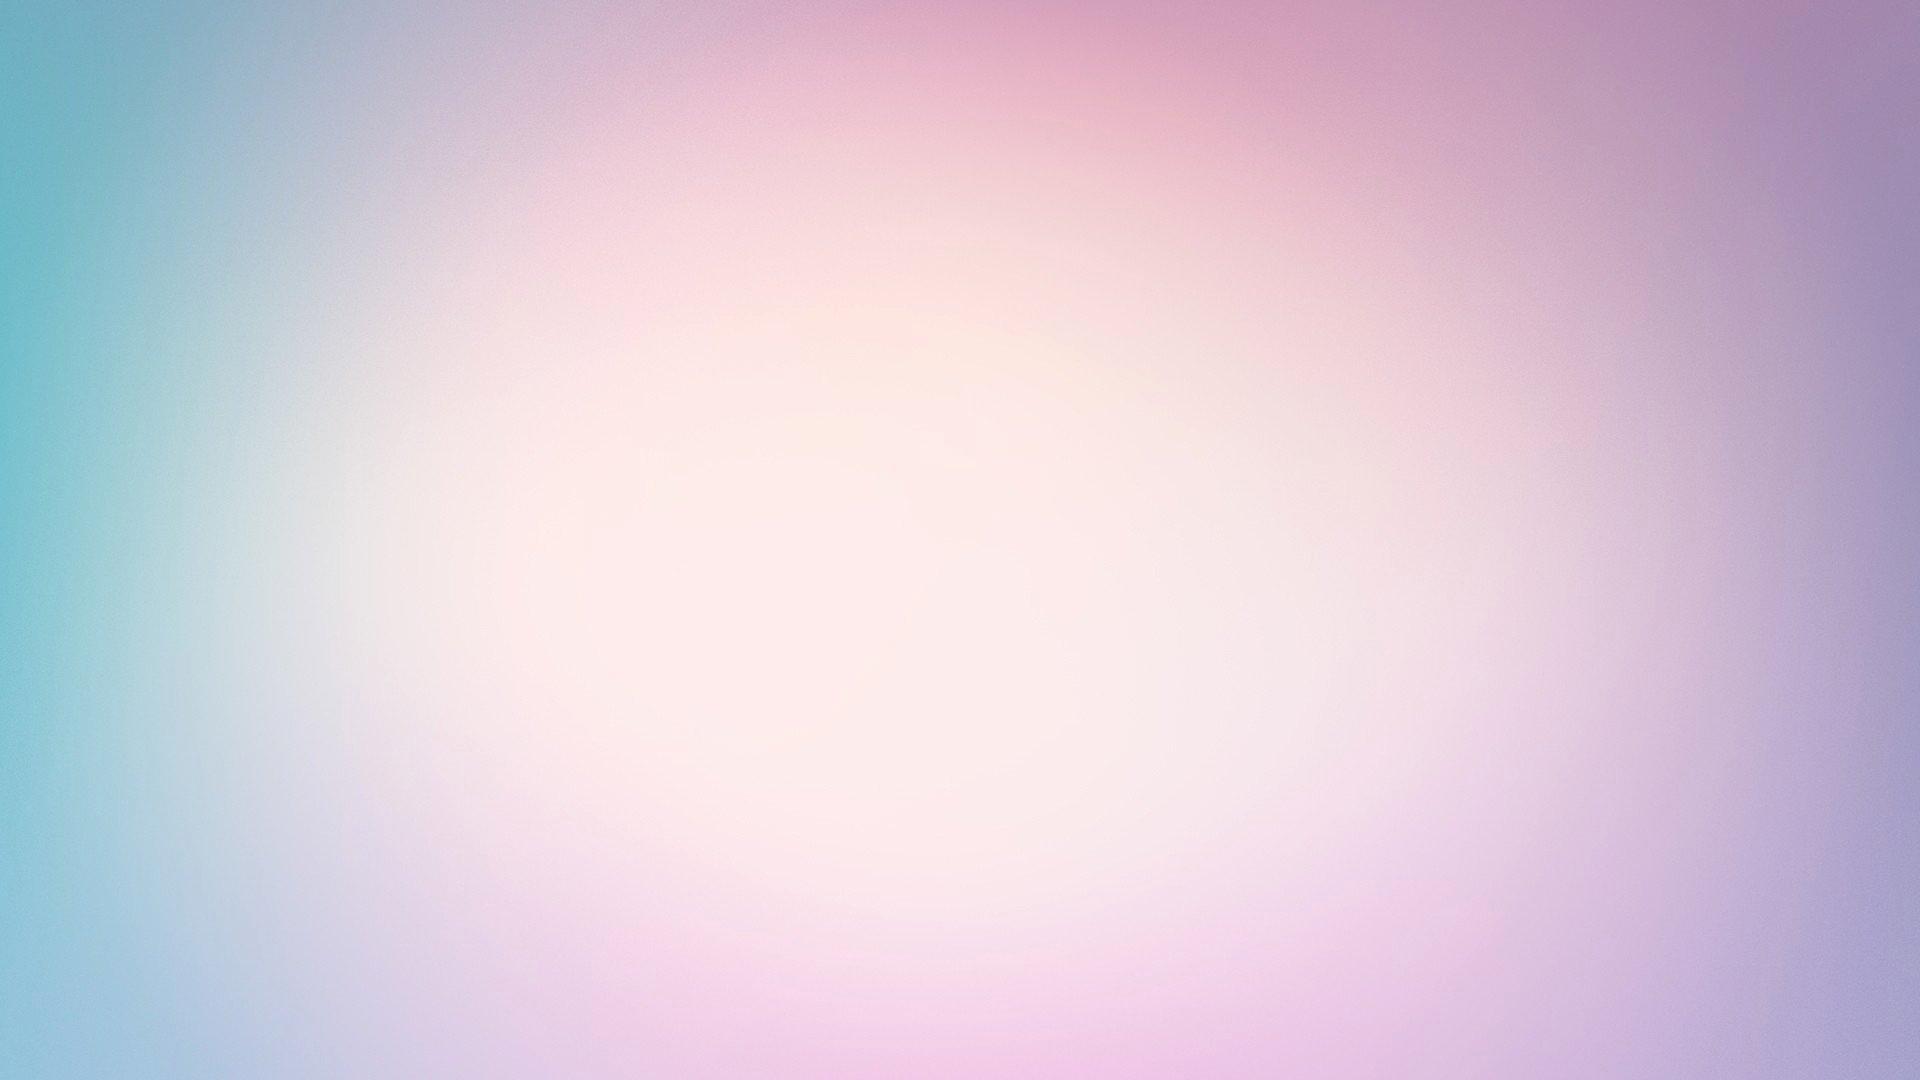 Simple White Tumblr Backgrounds Elegant Background Simple Tumblr ·① Wallpapertag